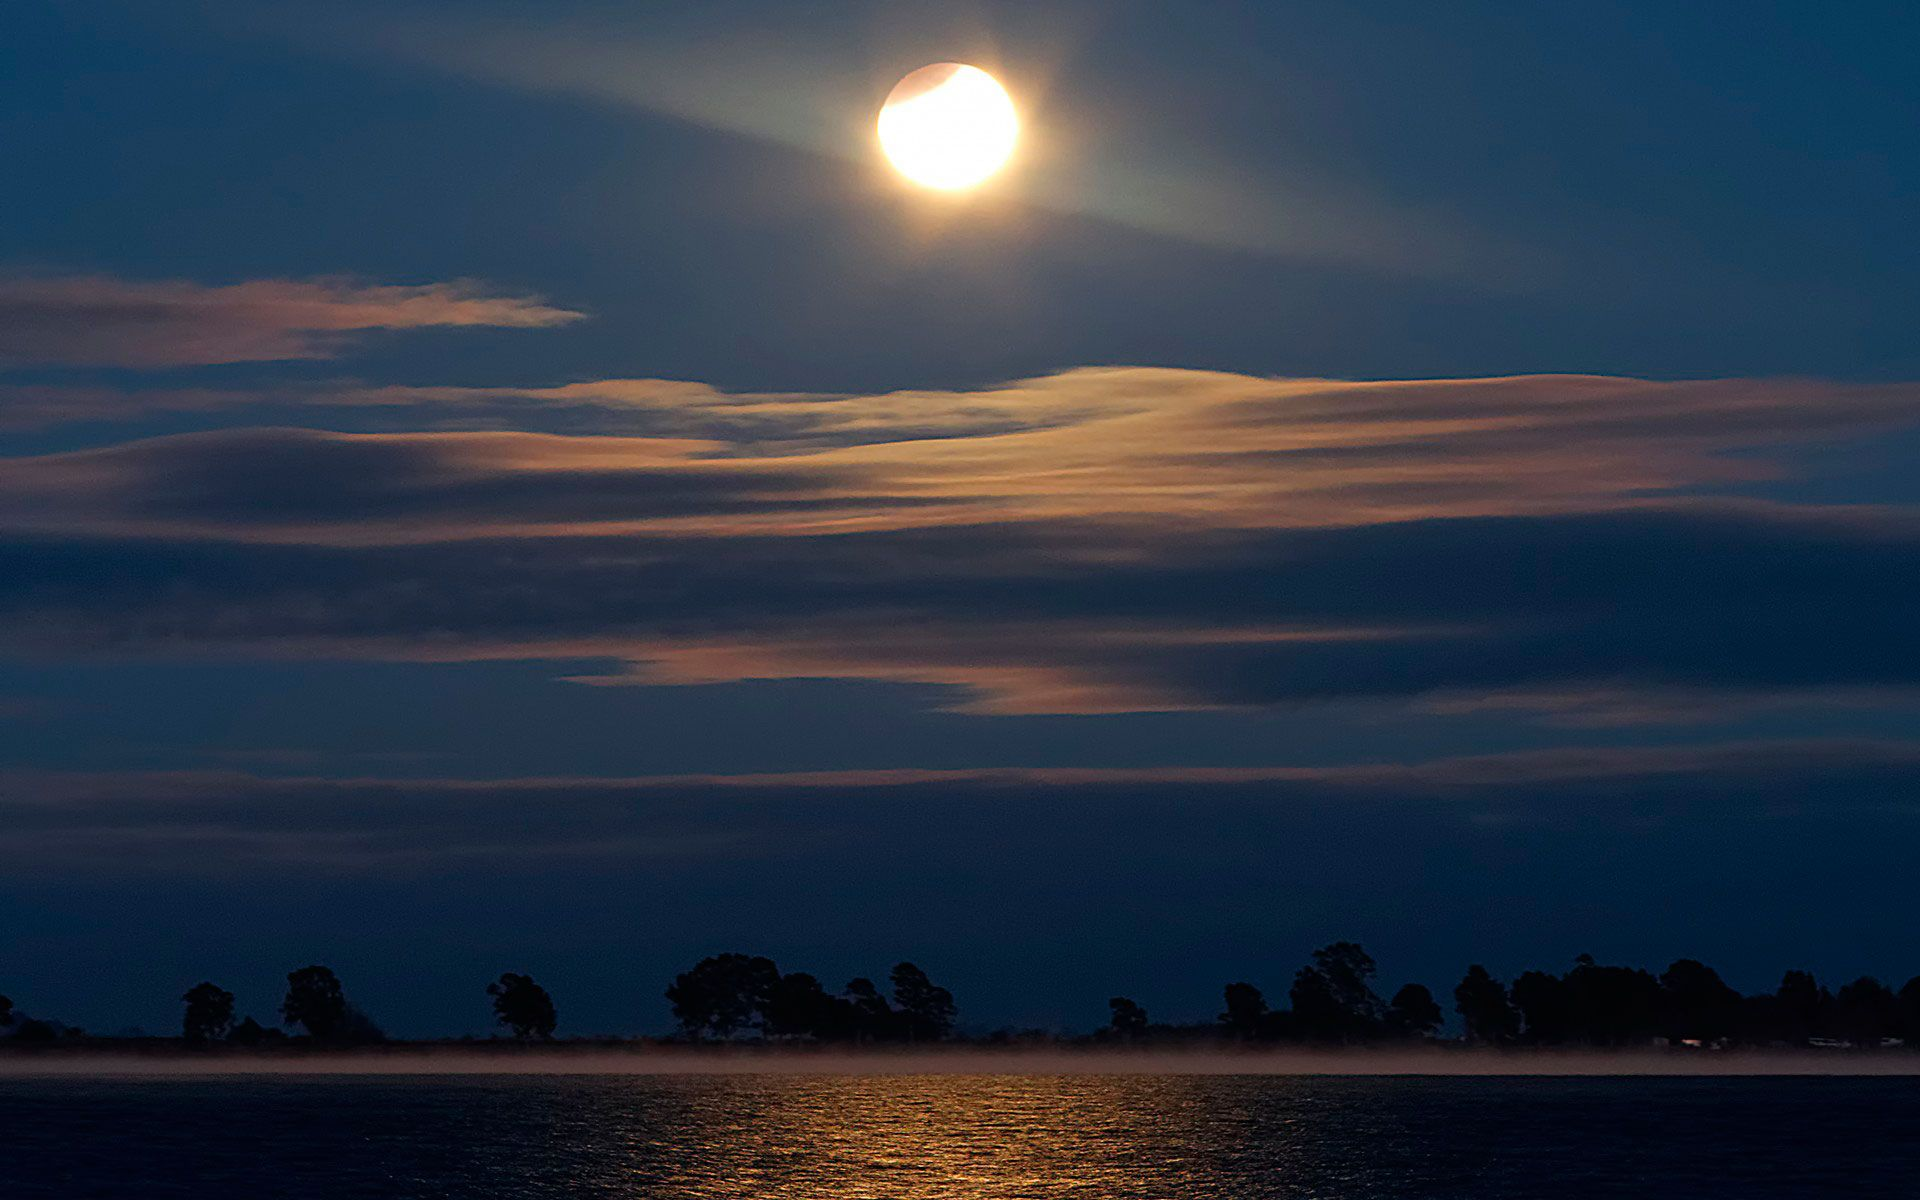 Картинки трактор, картинки вечер море и луна